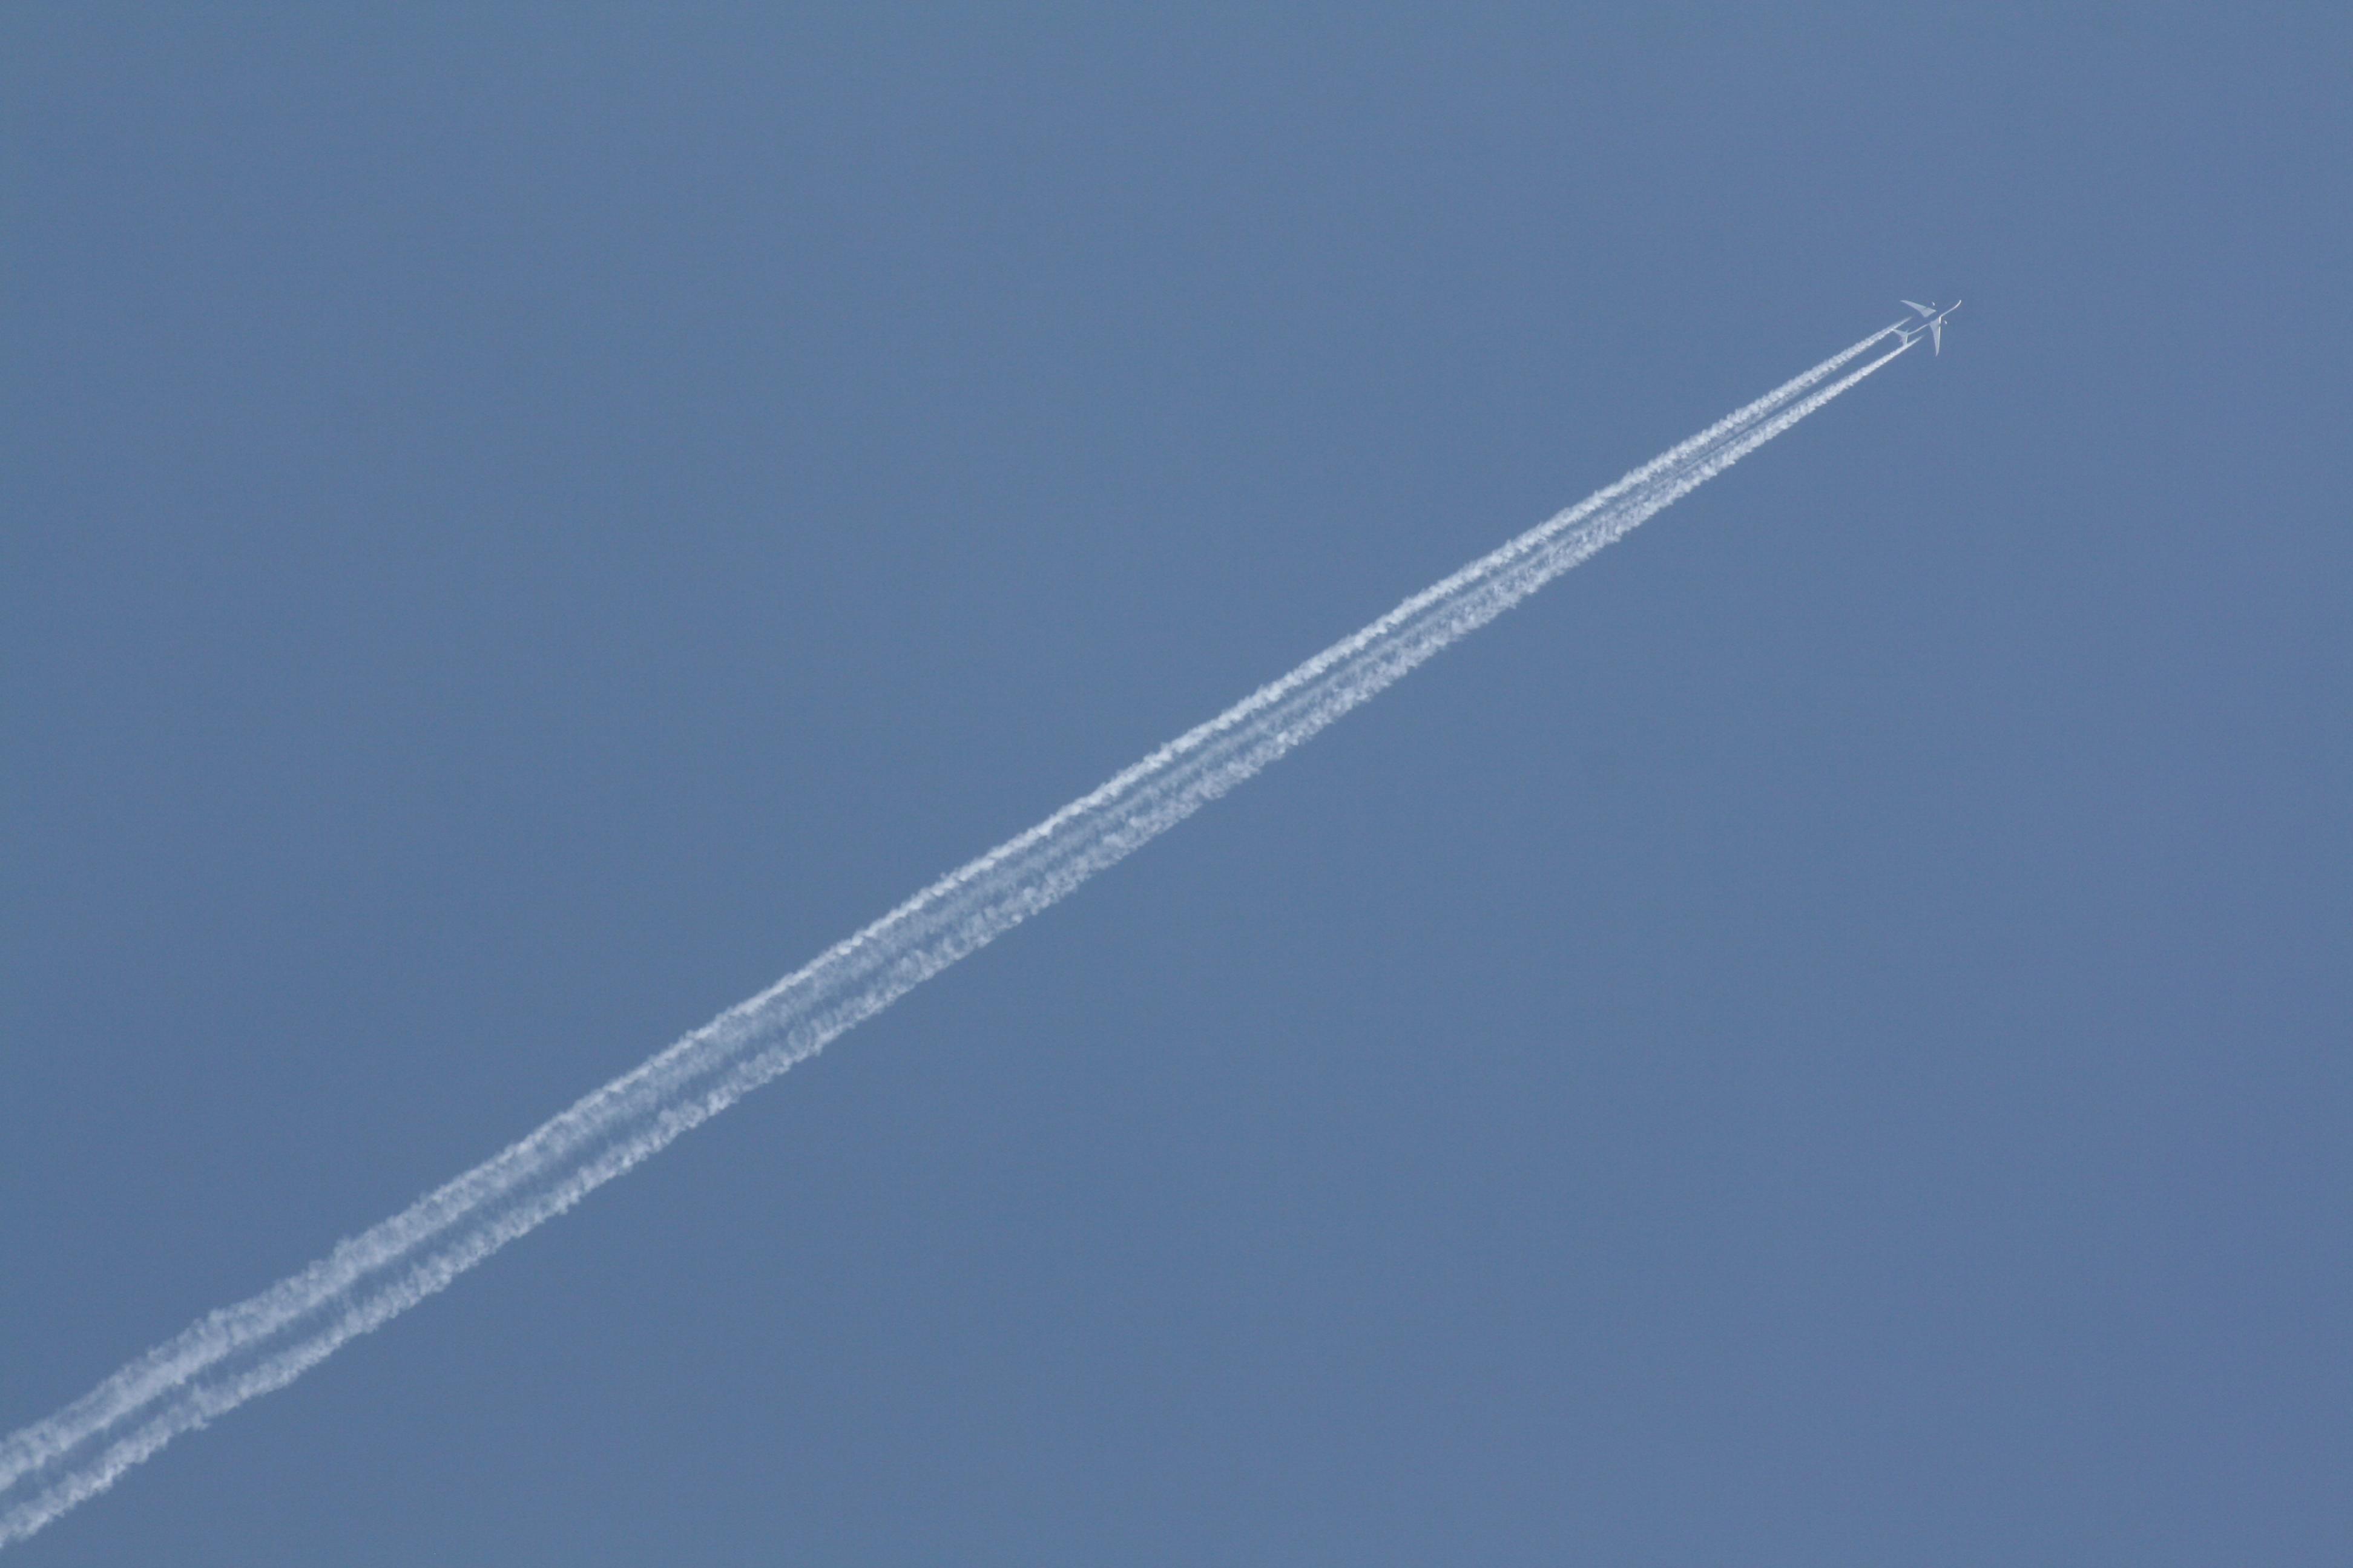 Naam: Boeing backgarden.jpg Bekeken: 584 Grootte: 391,7 KB